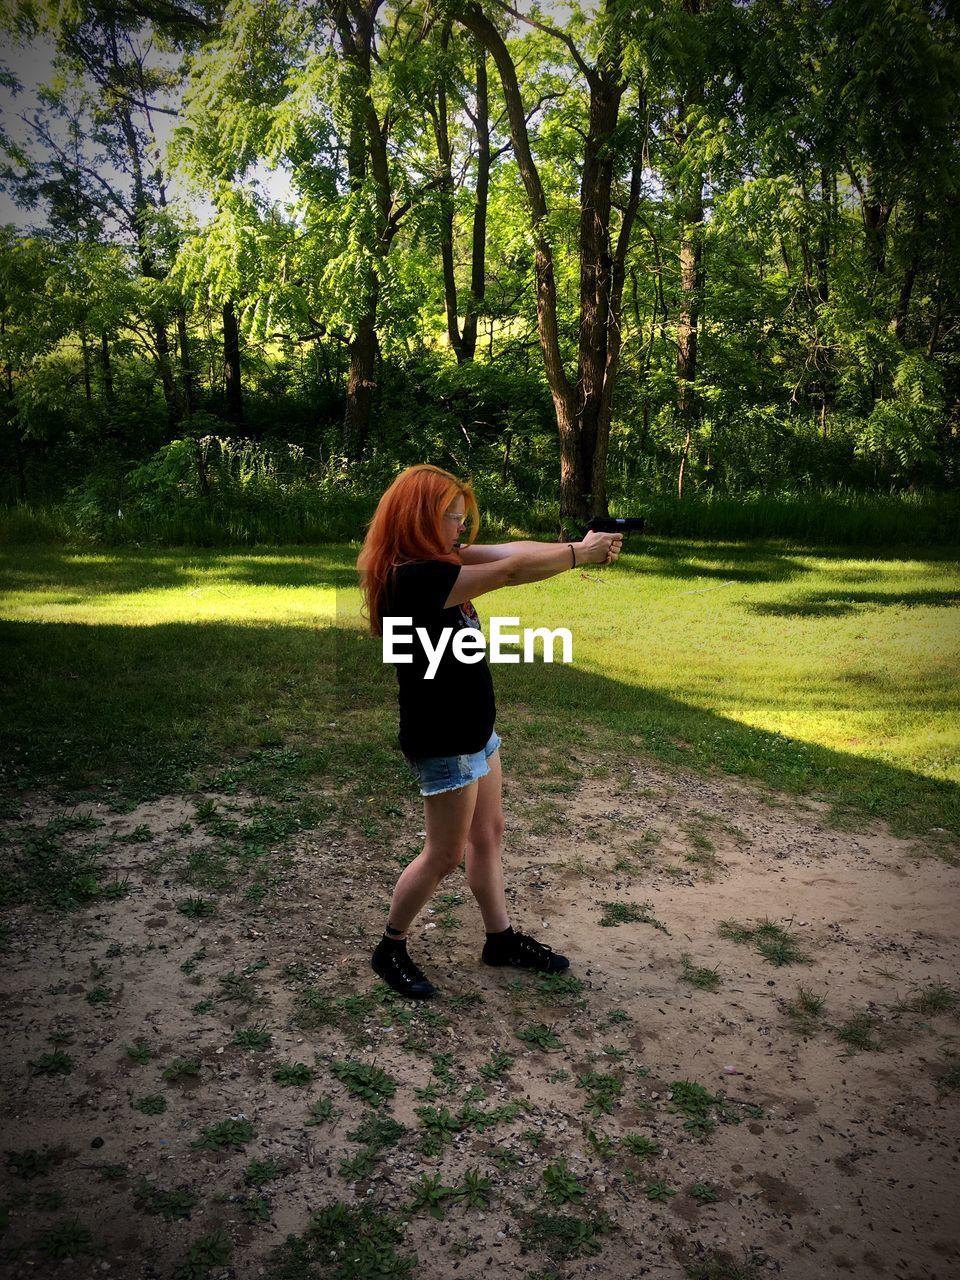 Full Length Of Woman Shooting Gun In Park Against Trees